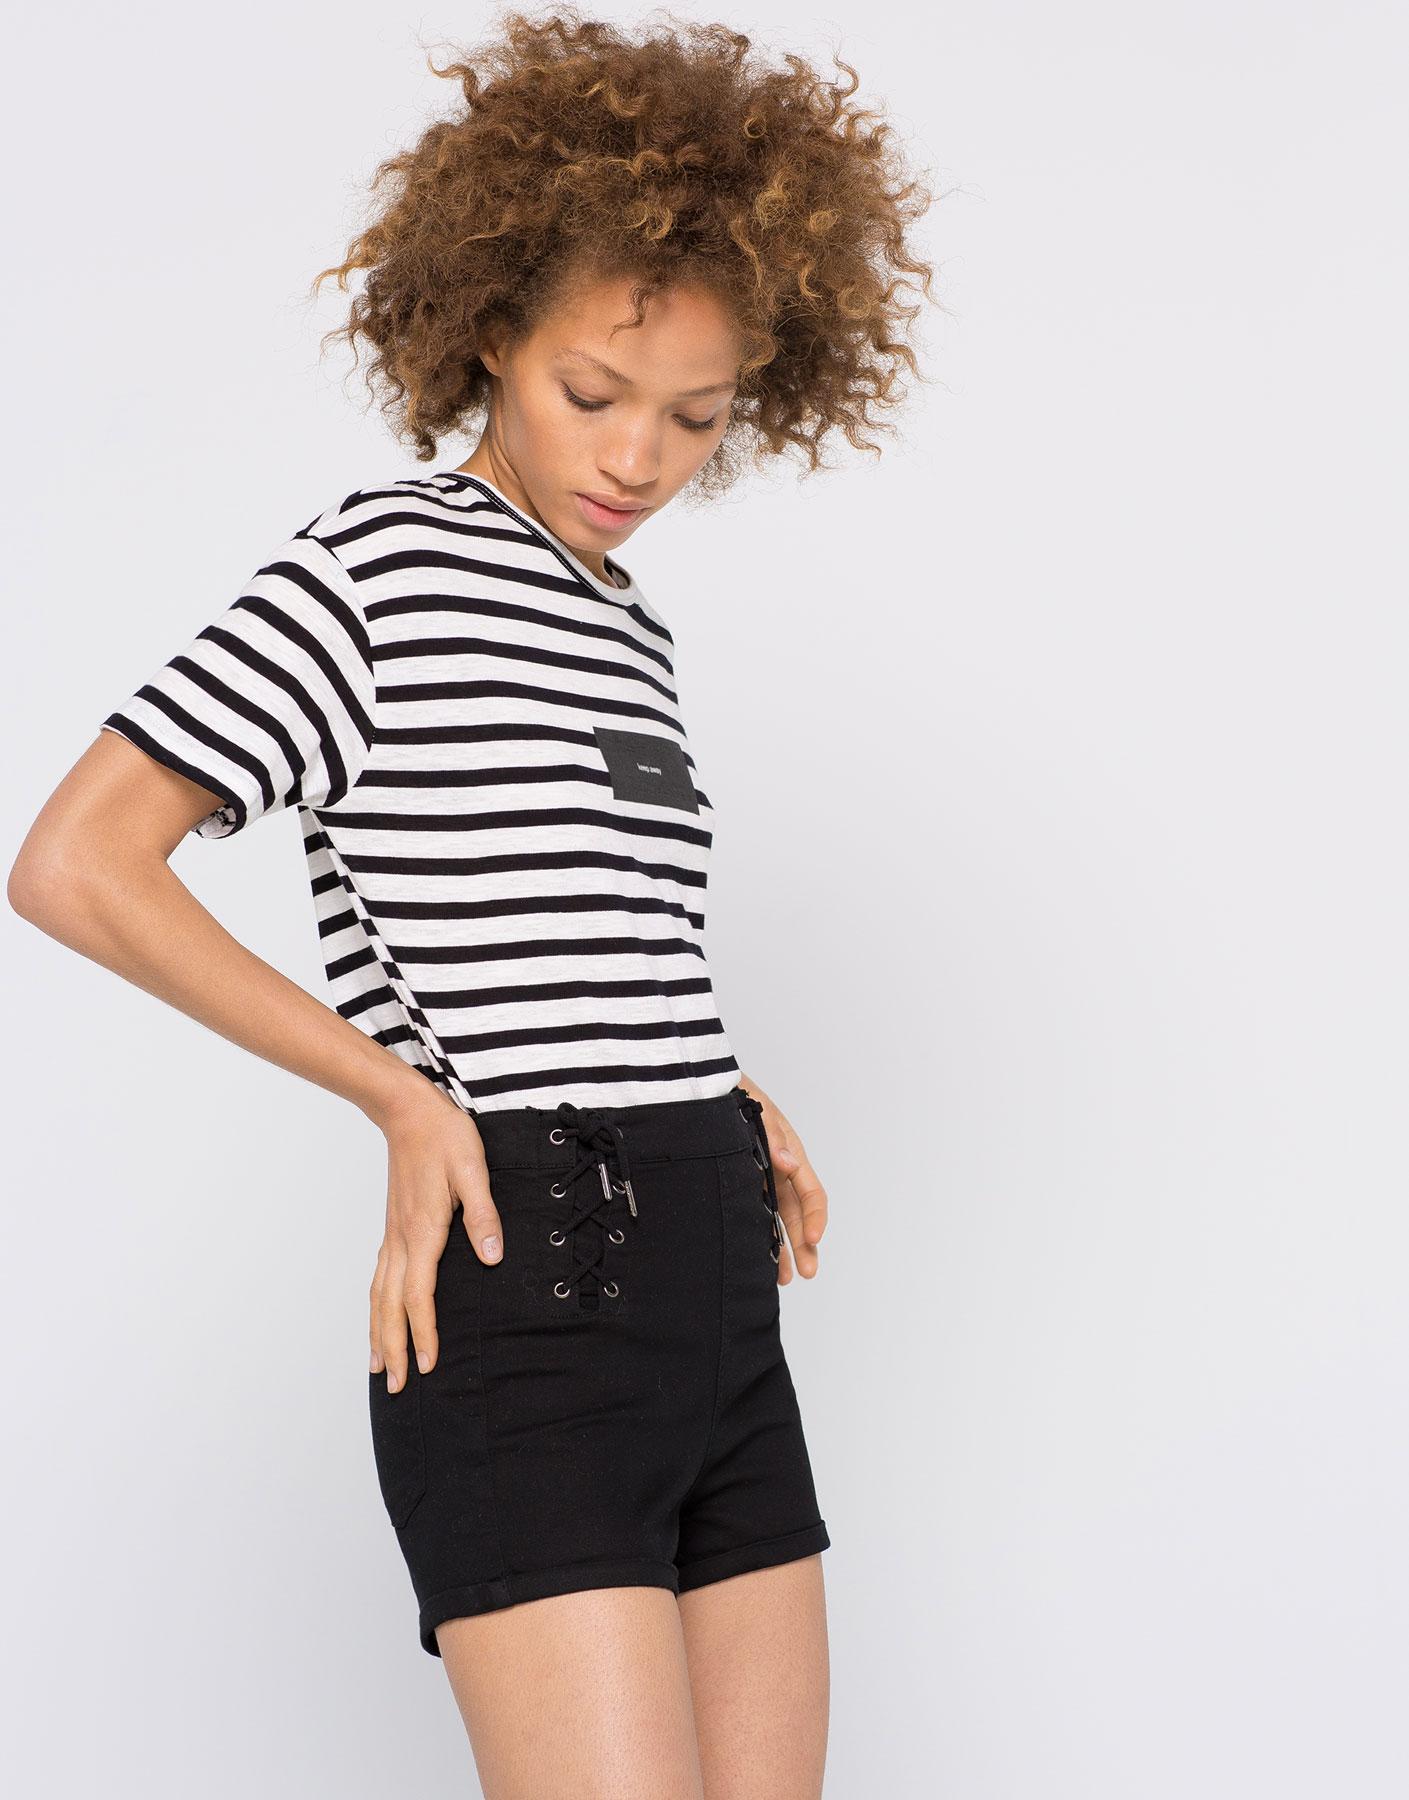 Corsair style shorts